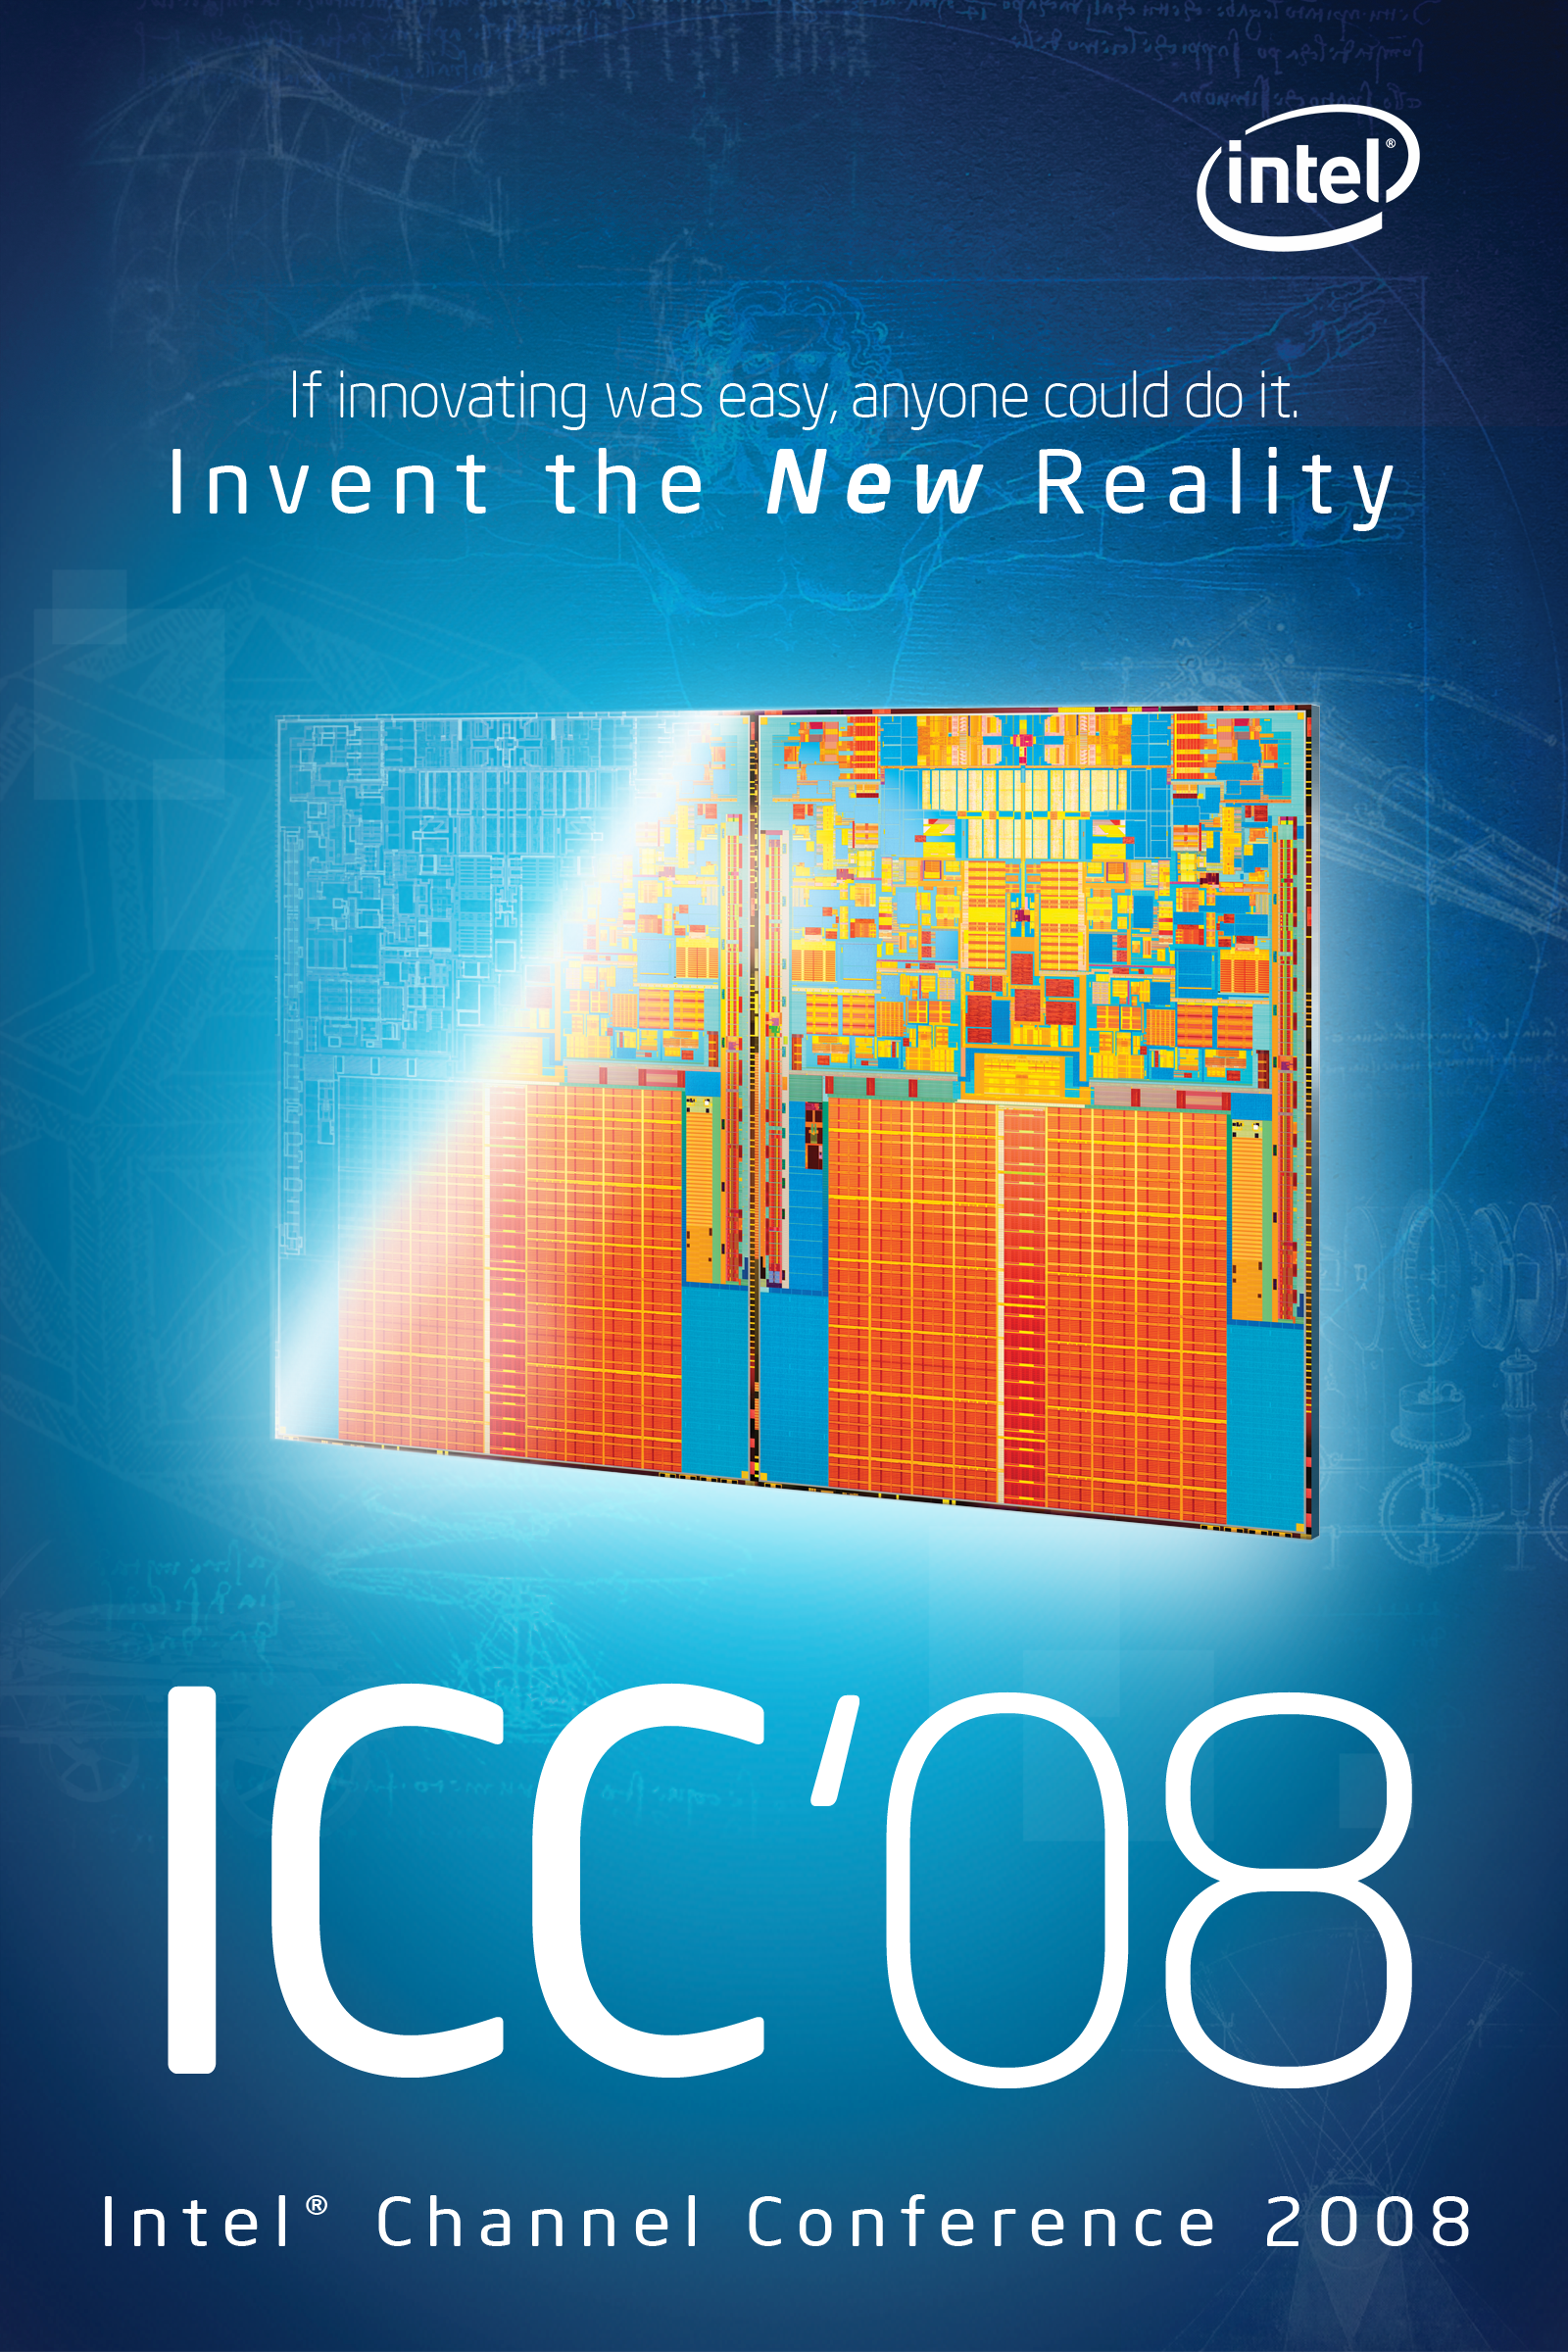 ICC_Fall08_DaVinci_Chip_2A.png